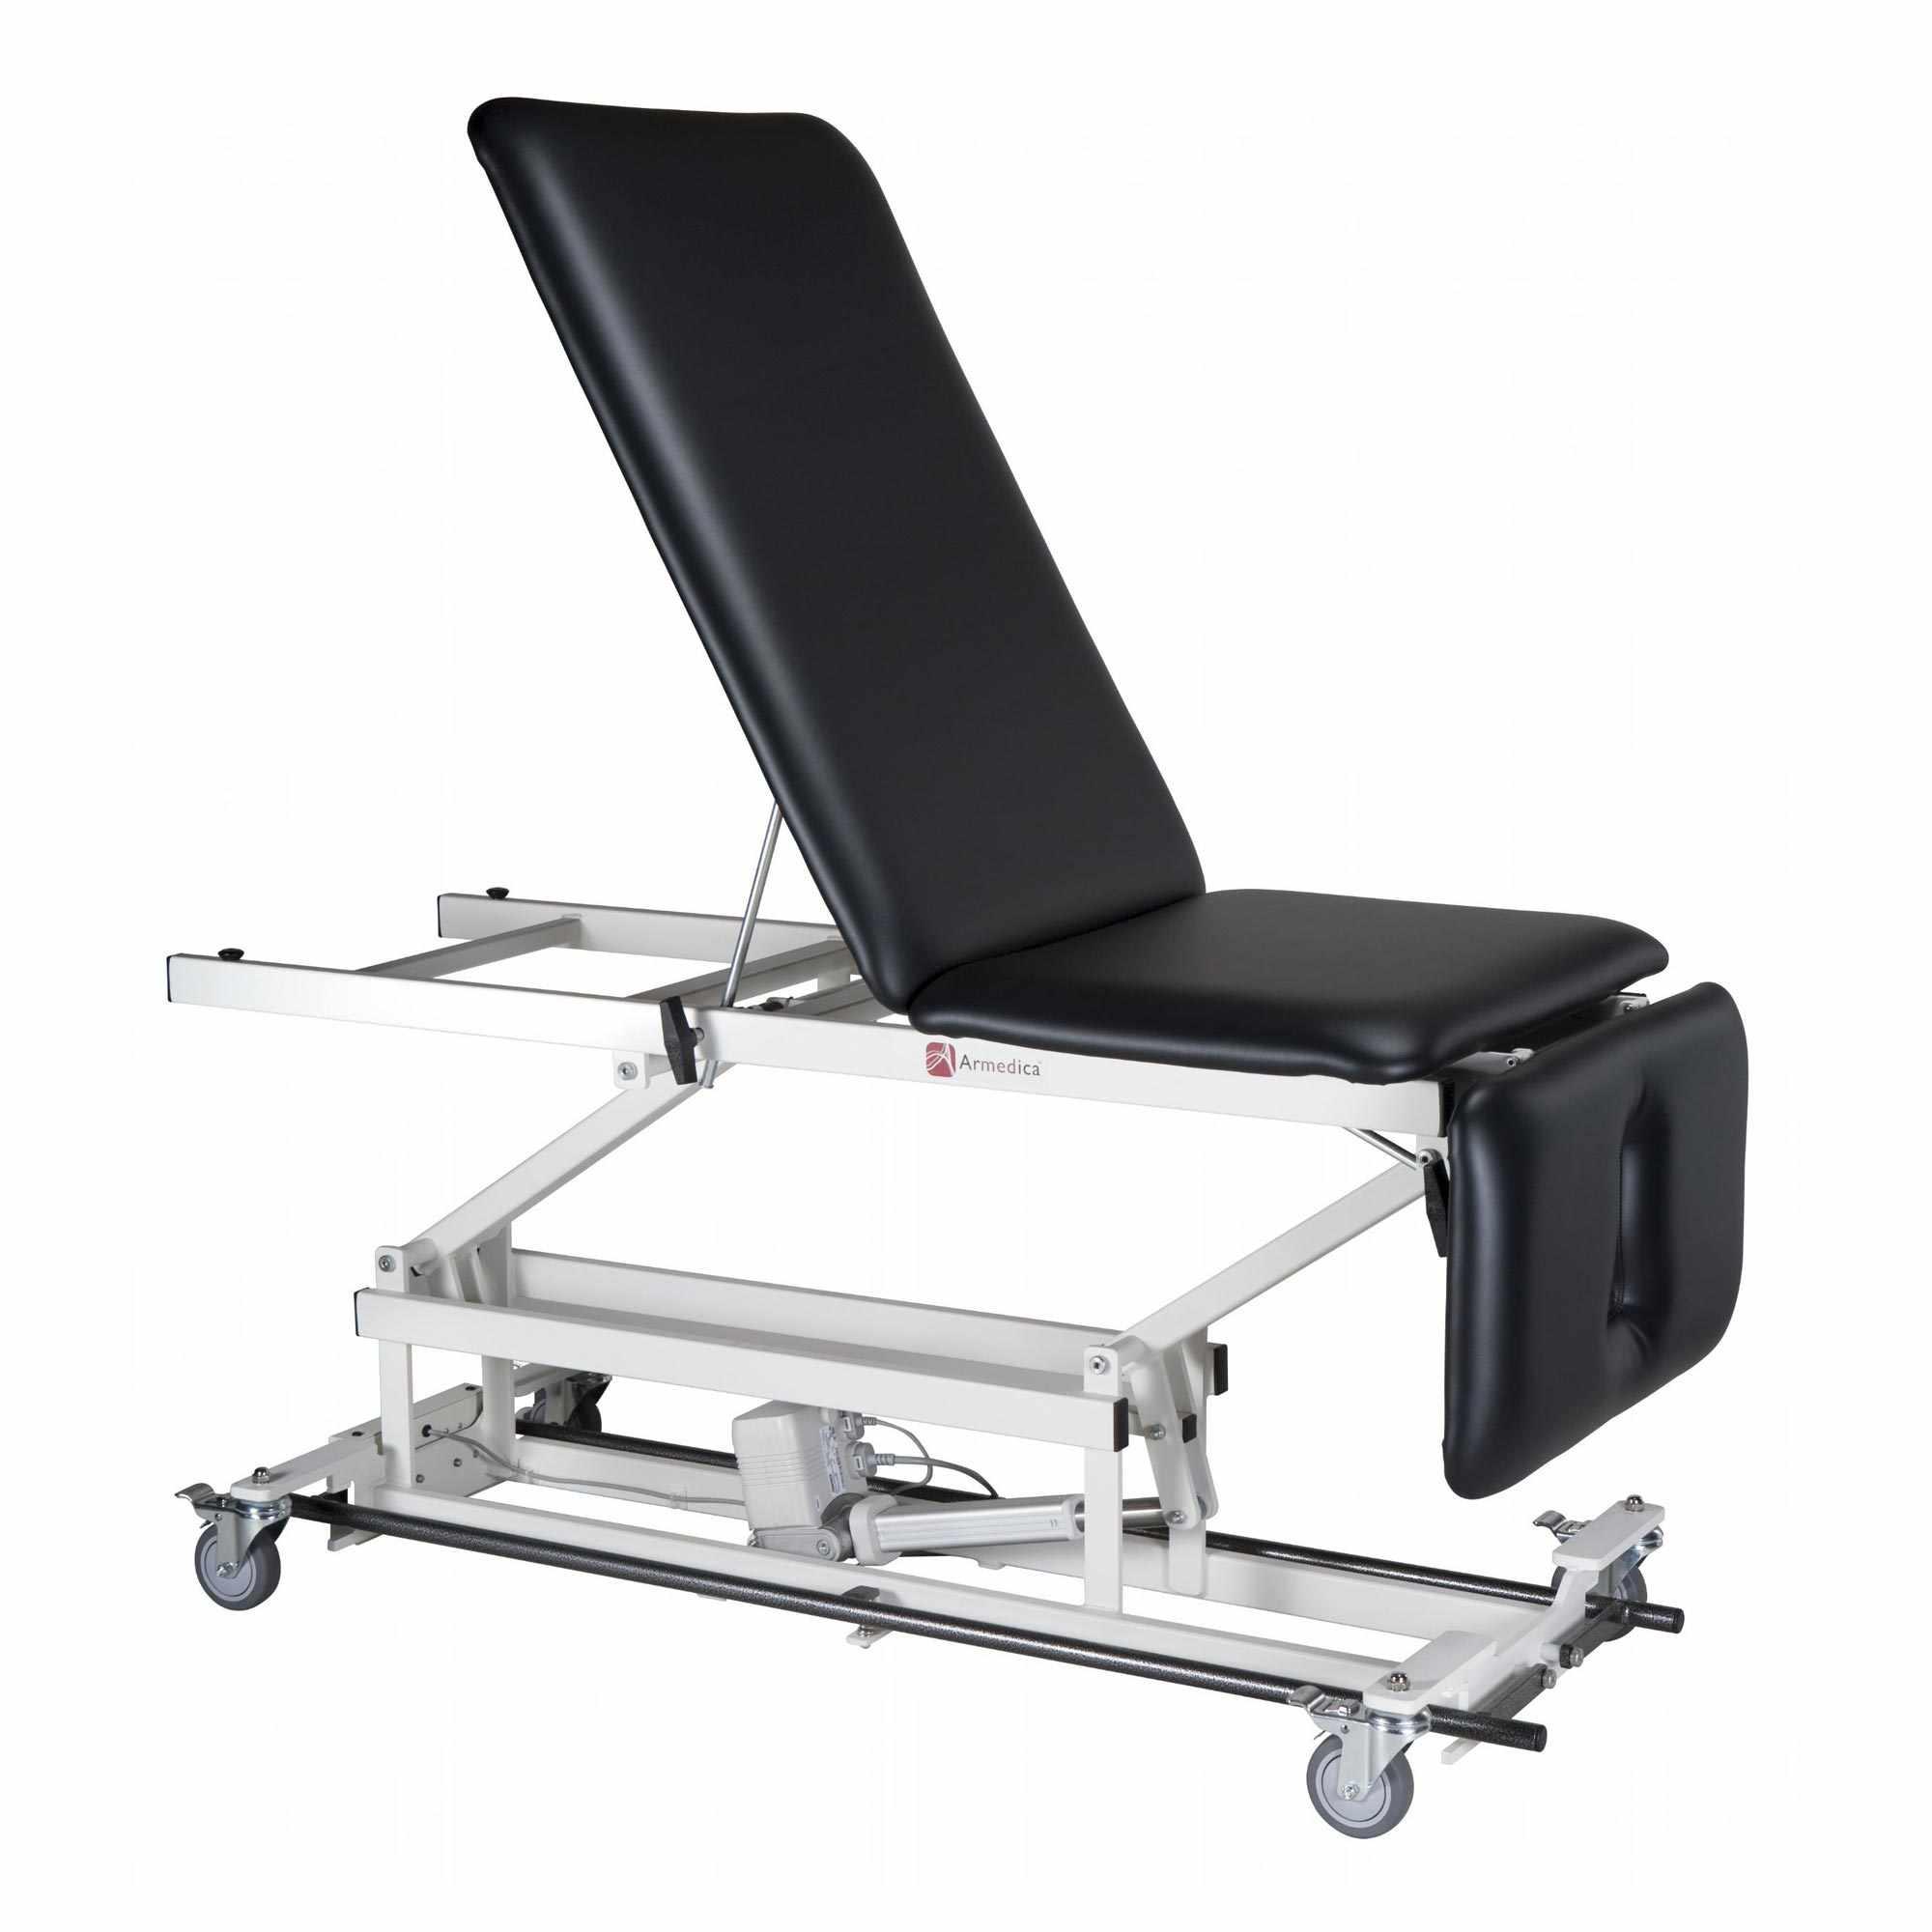 Armedica AM-BA 350 treatment table